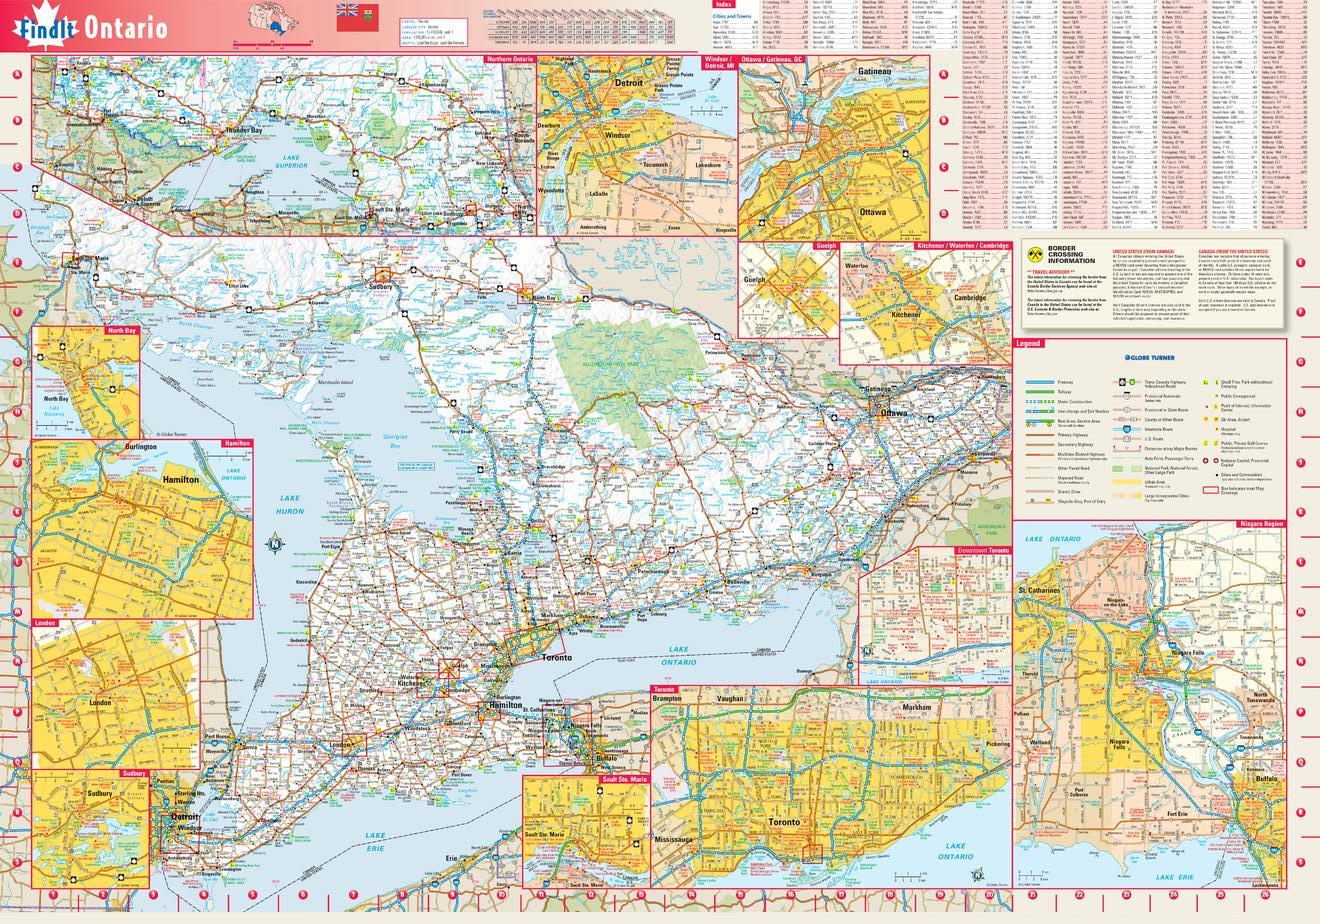 Ontario Maps - MapTrove